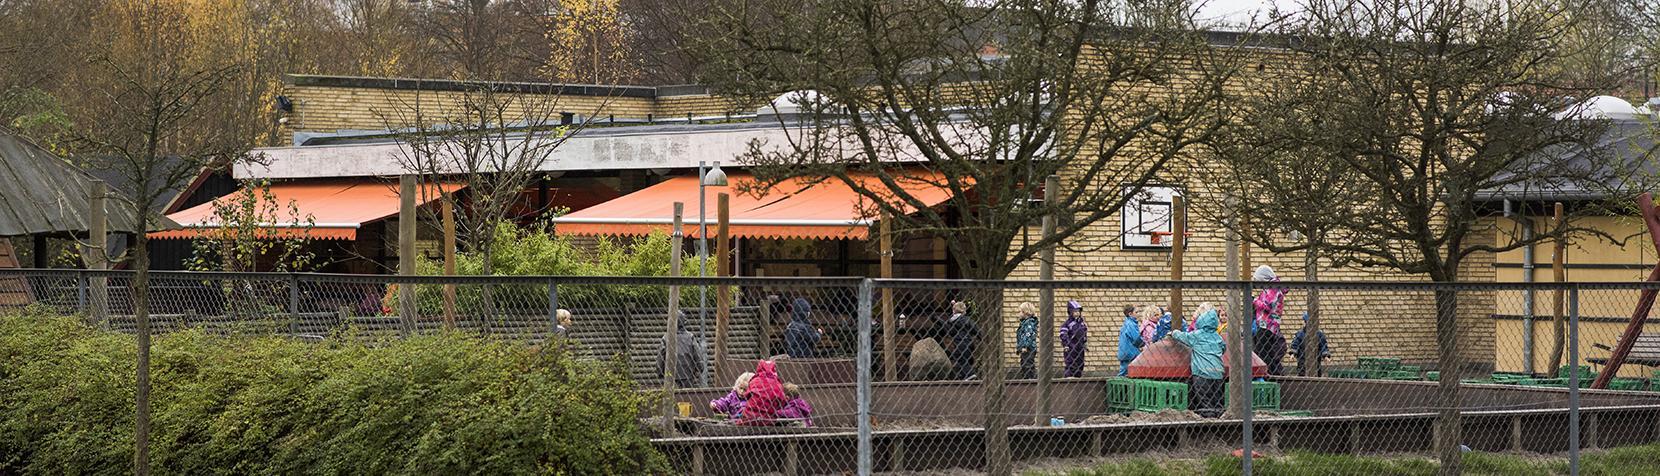 Børnehuset Mariehøj